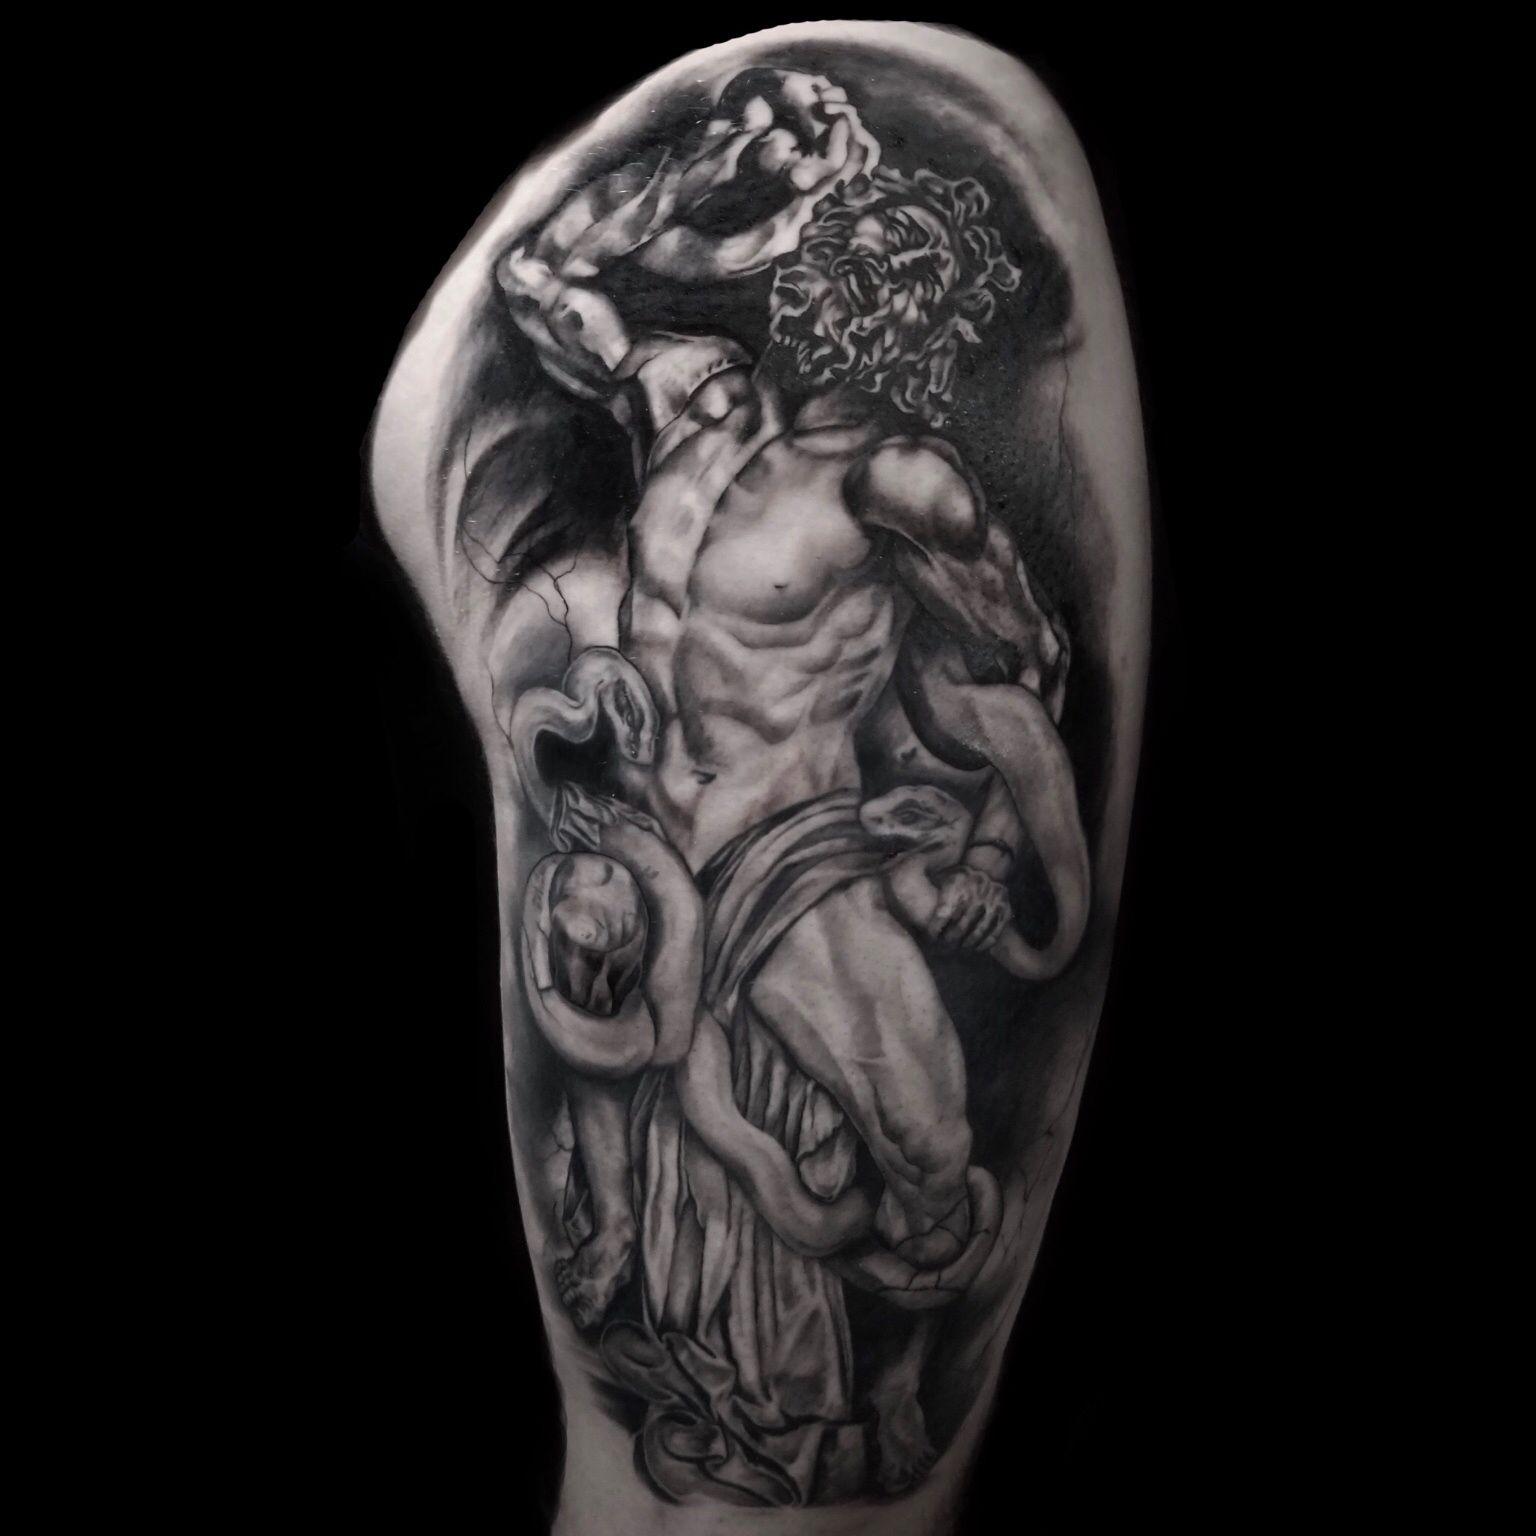 Calebmorgantattoo Finished Up This Massive Thigh Panel In Three Sessions Stygiangallery Atlantatattoo Skinartma Statue Tattoo Tattoos Mythology Tattoos